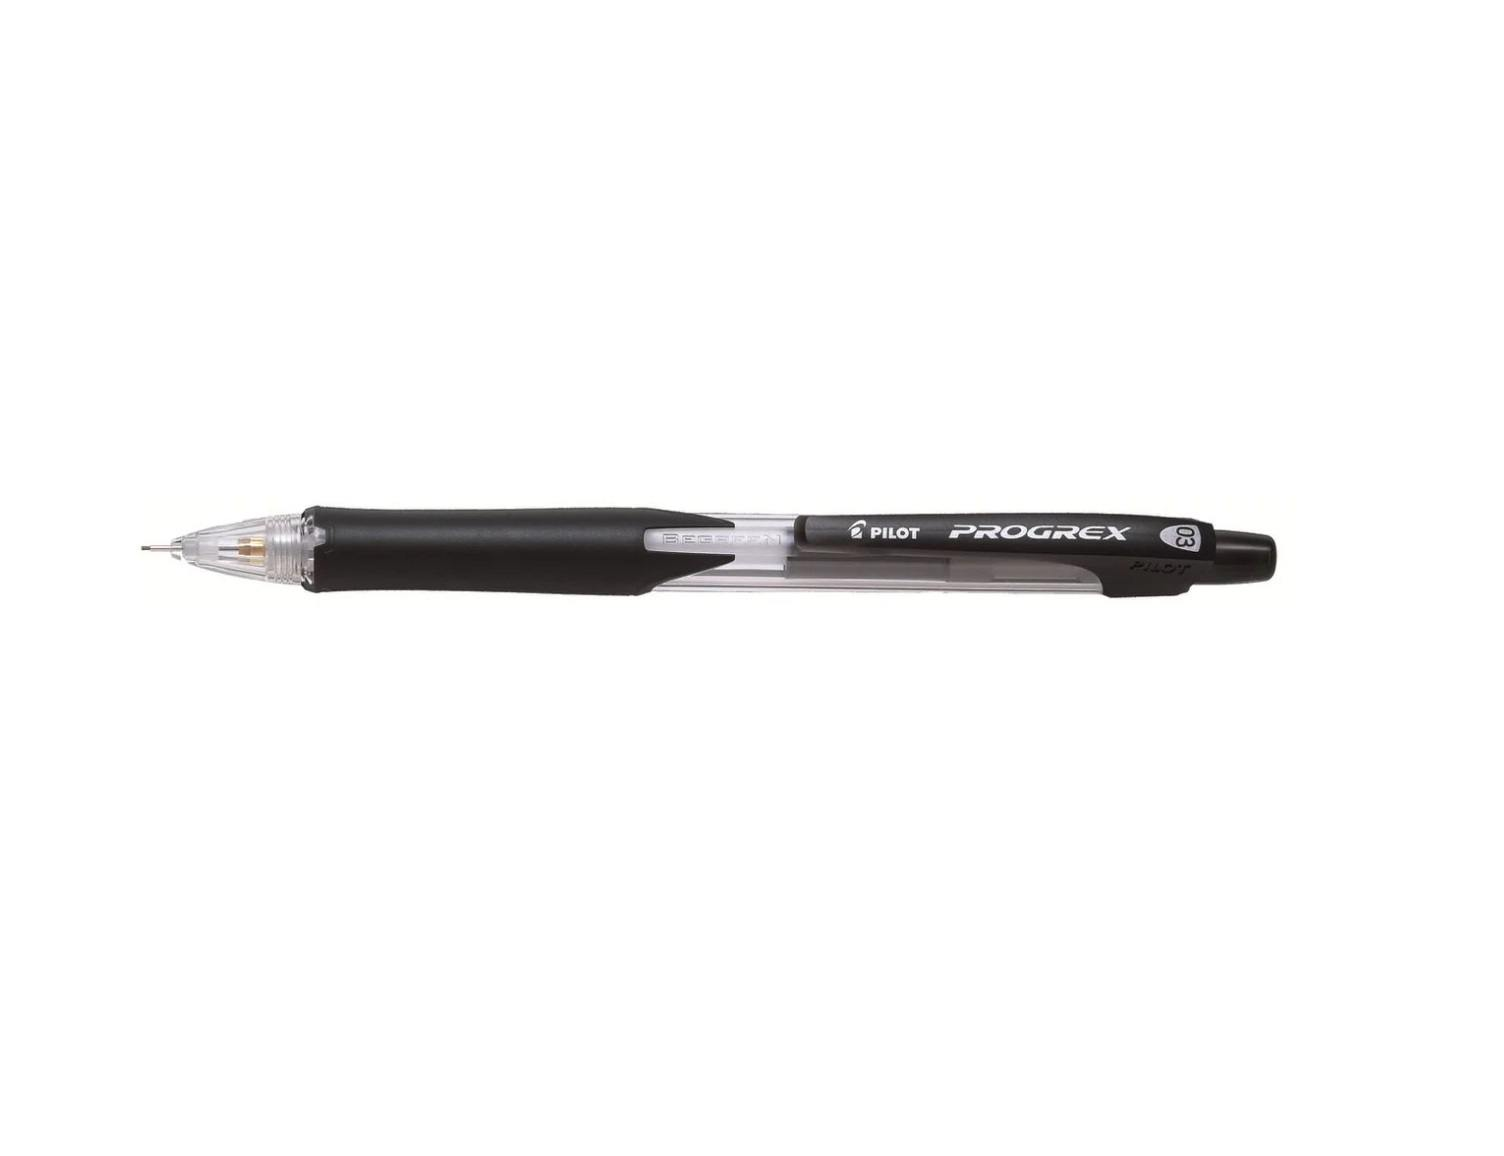 Pilot Progrex Mechanical Pencil